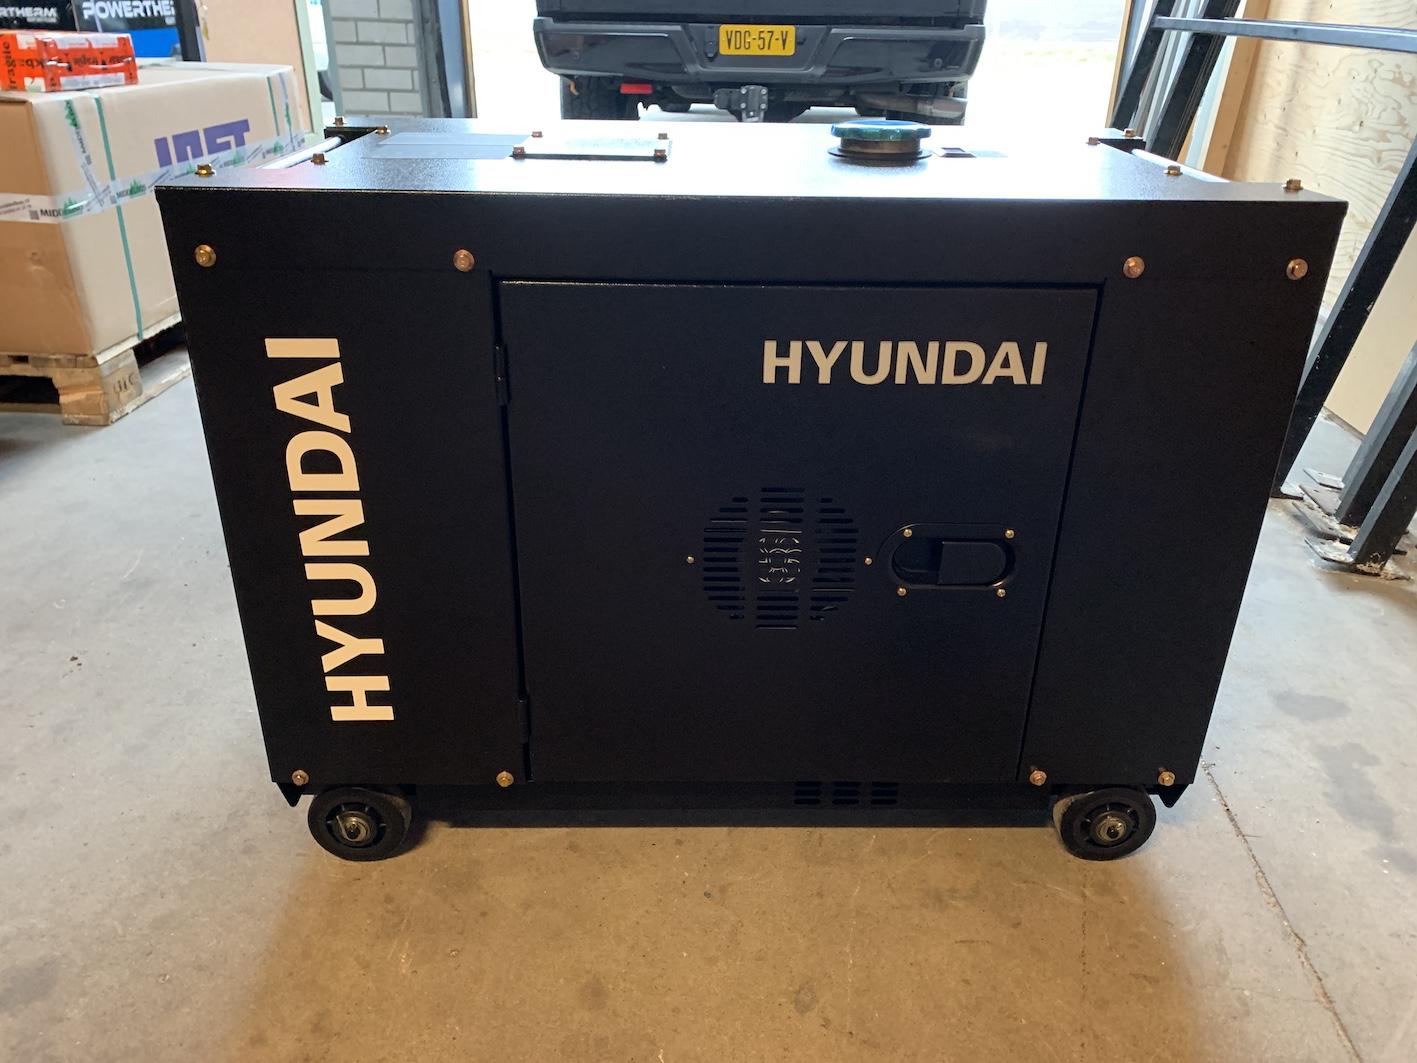 Hyundai heavy duty agregator HDG12 new 15